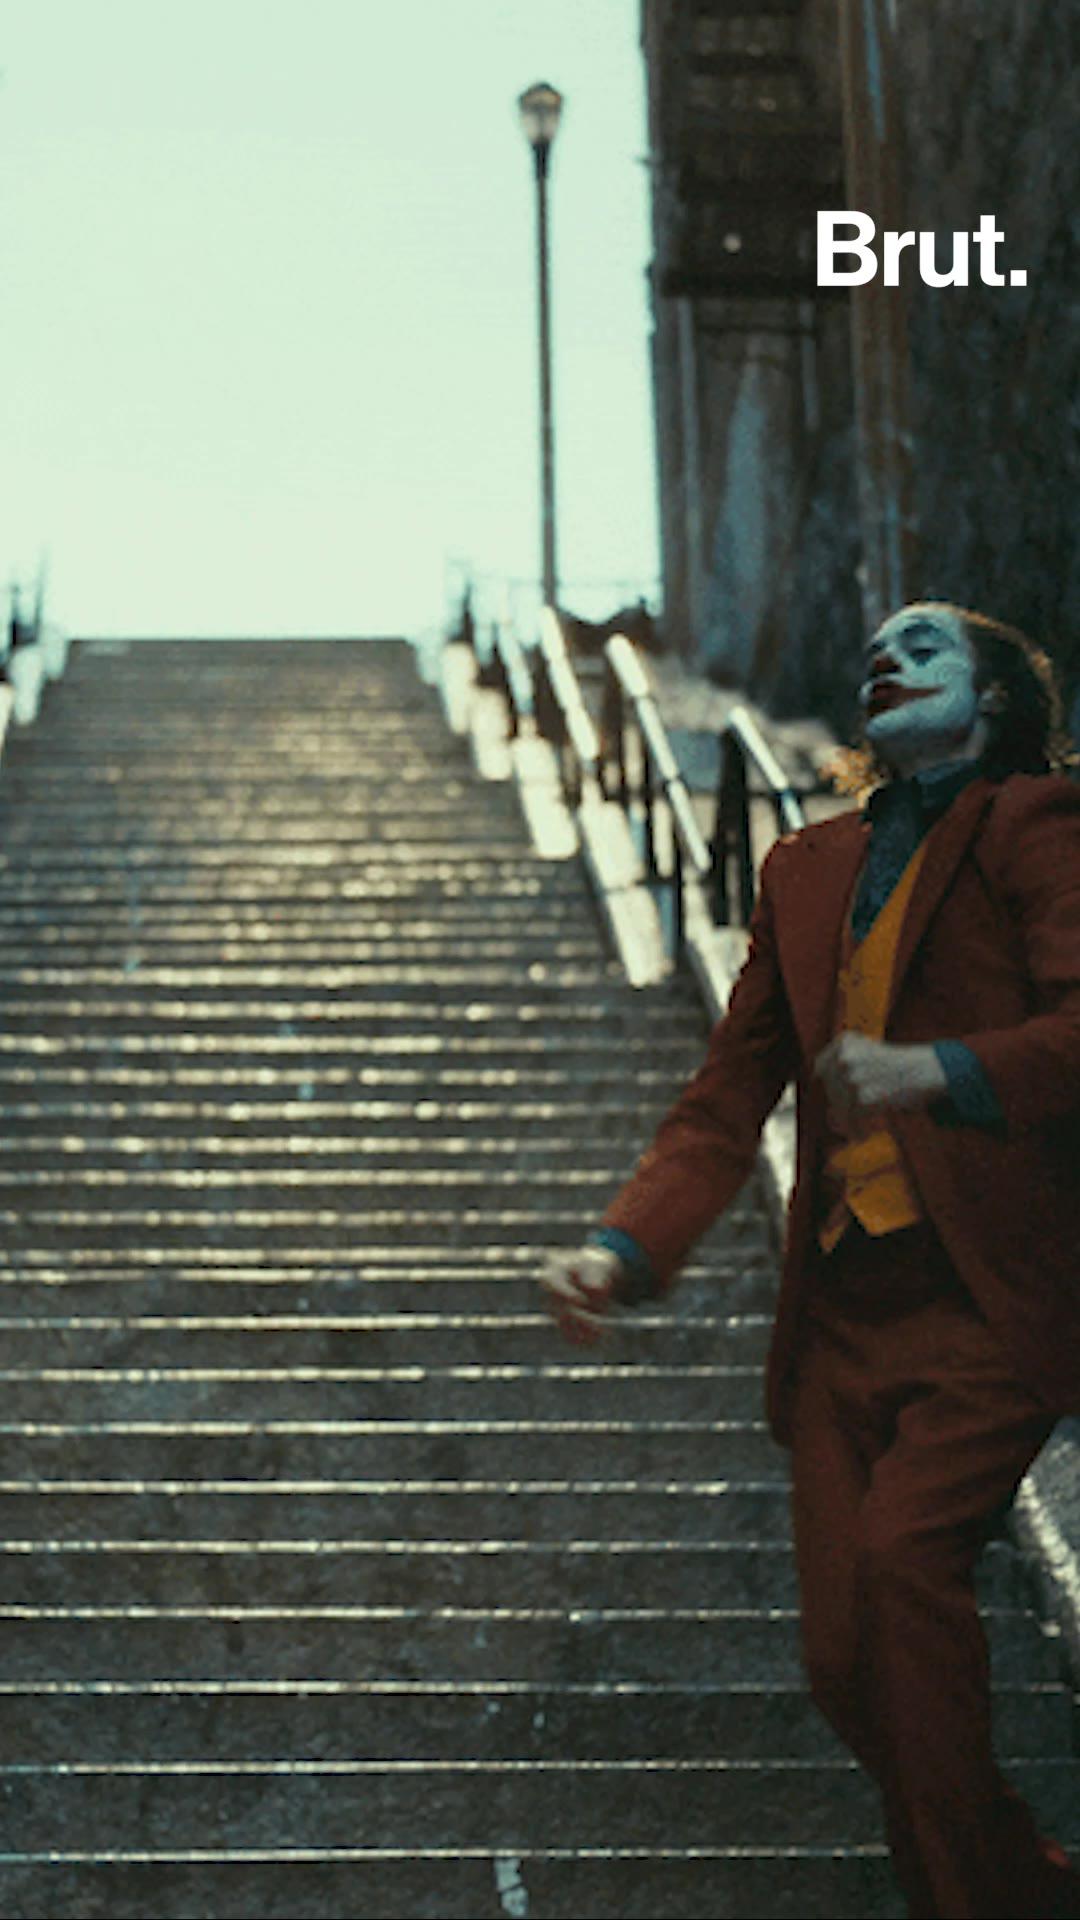 Tourists Flock To Joker Stairs Brut